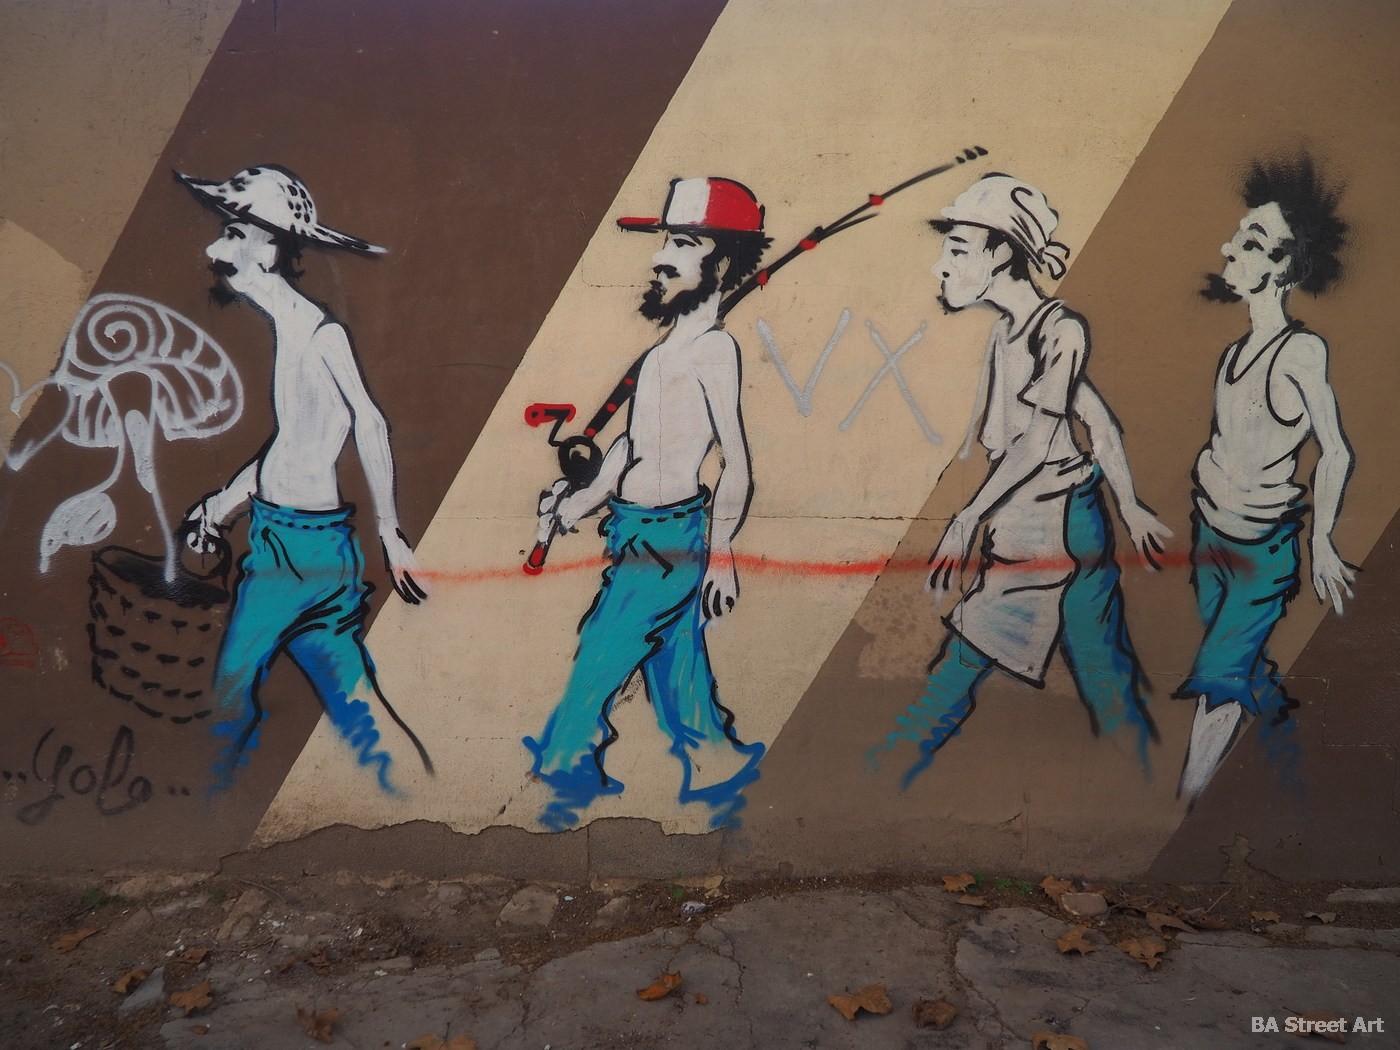 lolo mural arte urbano artista fishermen valencia cabanyal pescadores arte callejero buenosairesstreetart.com